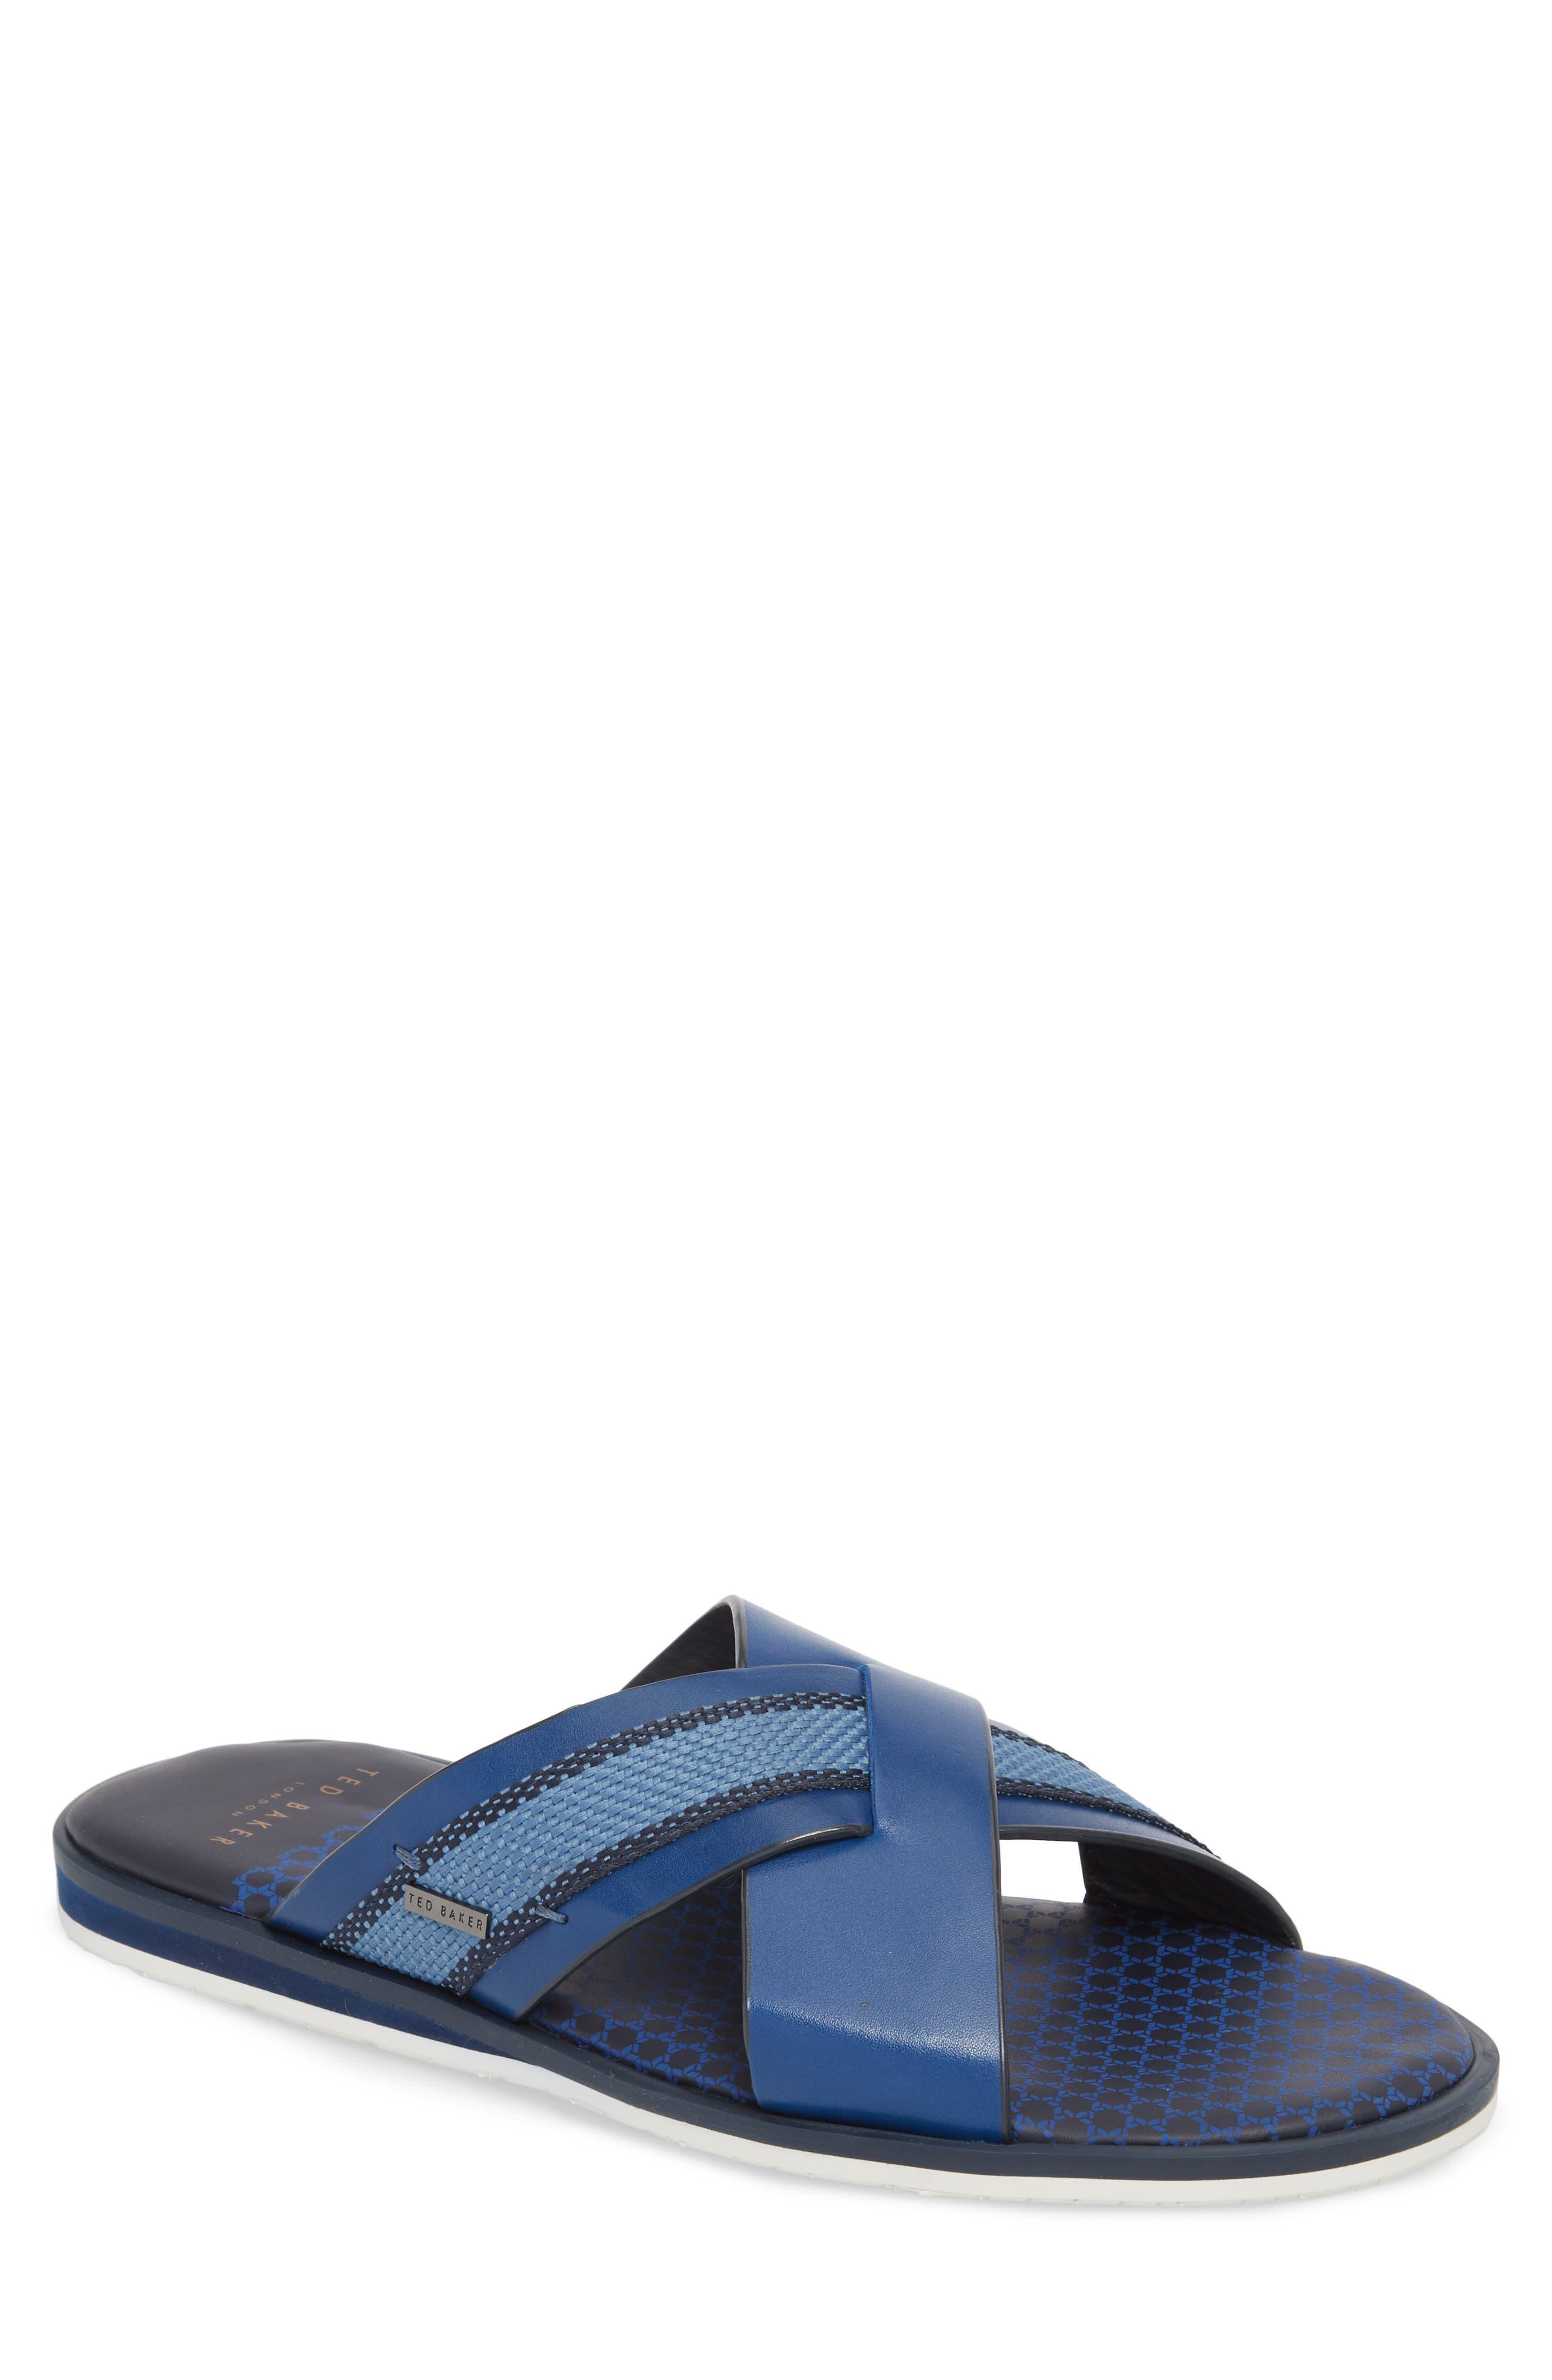 Farrull Cross Strap Slide Sandal,                             Main thumbnail 1, color,                             BLUE LEATHER/TEXTILE